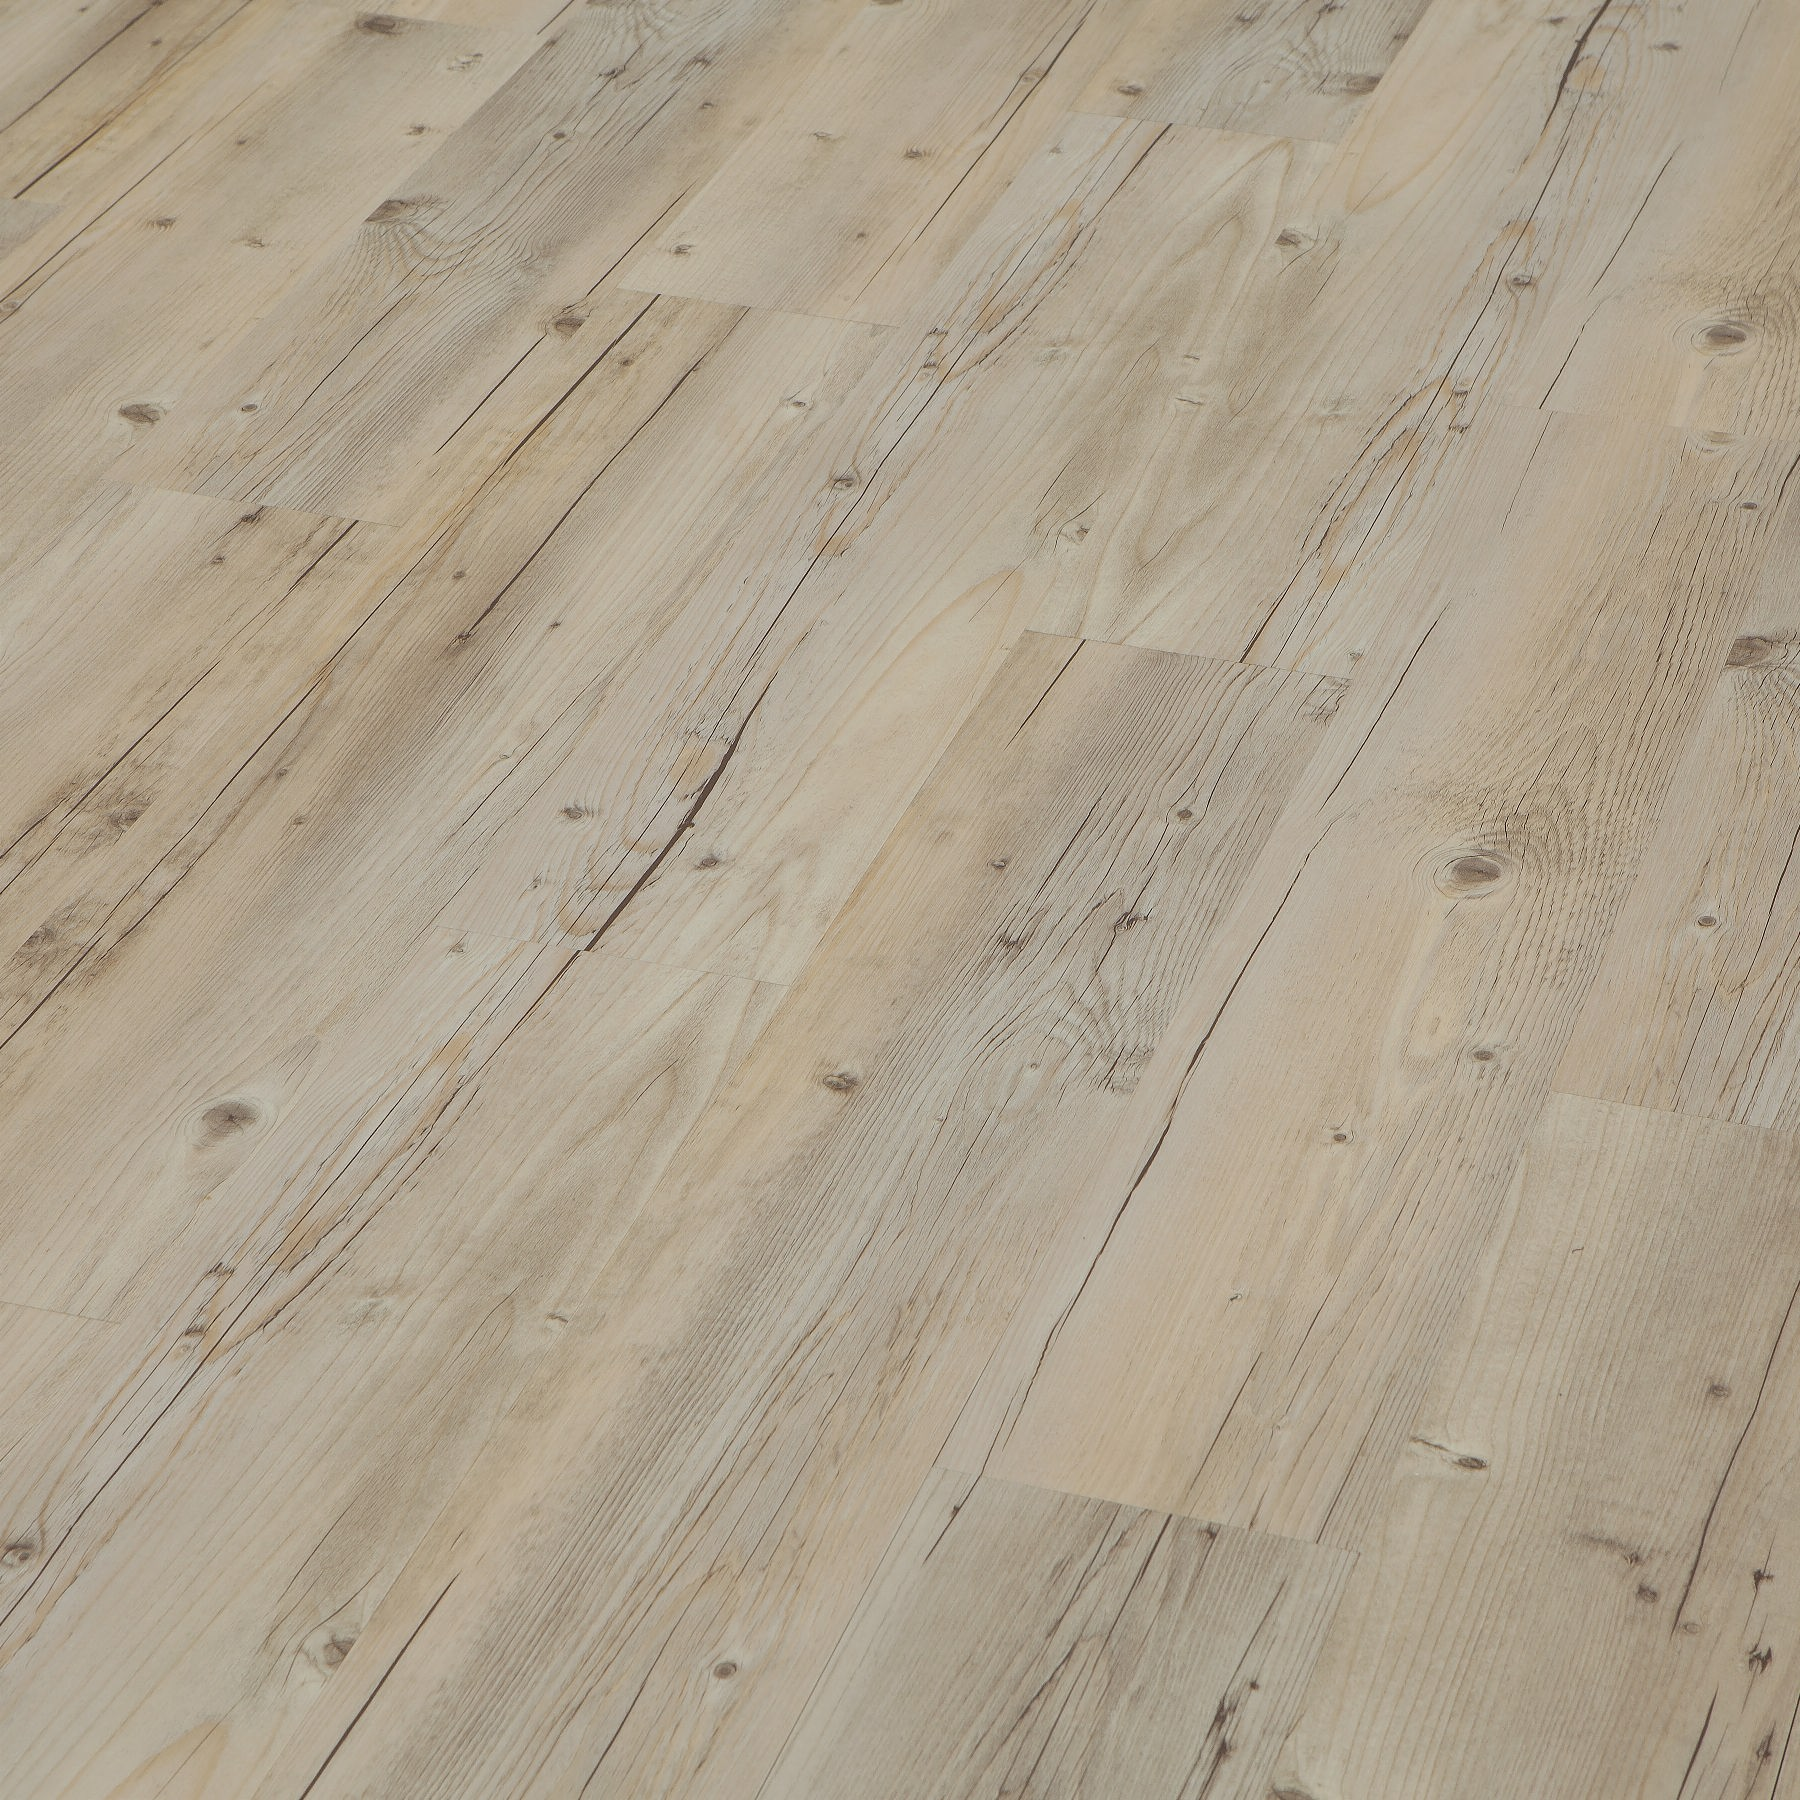 Vinylová podlaha Adramaq, dekor Moruše béžová